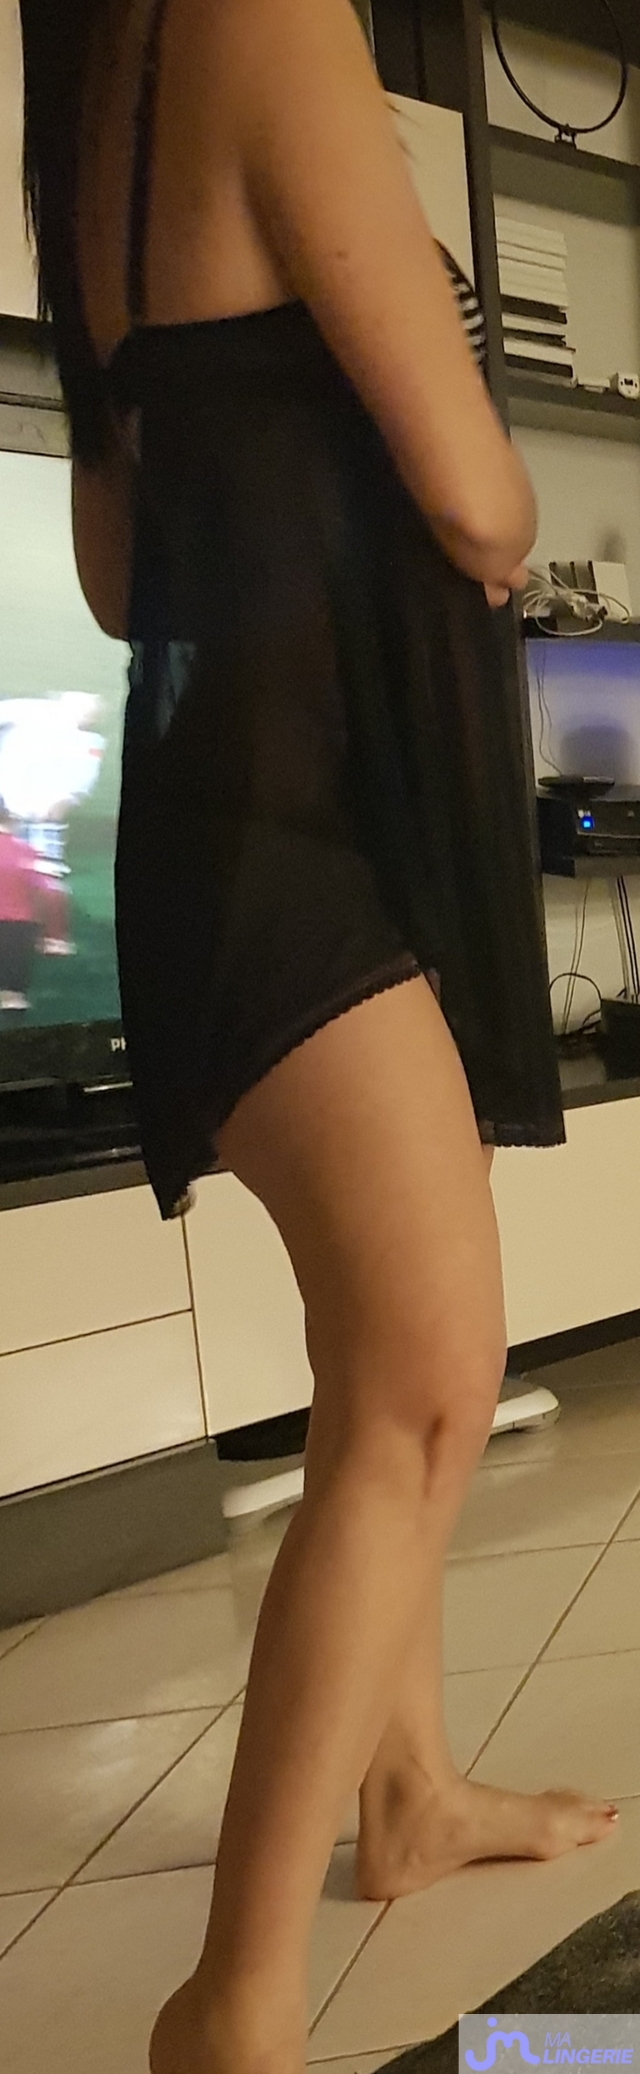 Photo de la lingerie de Ita22